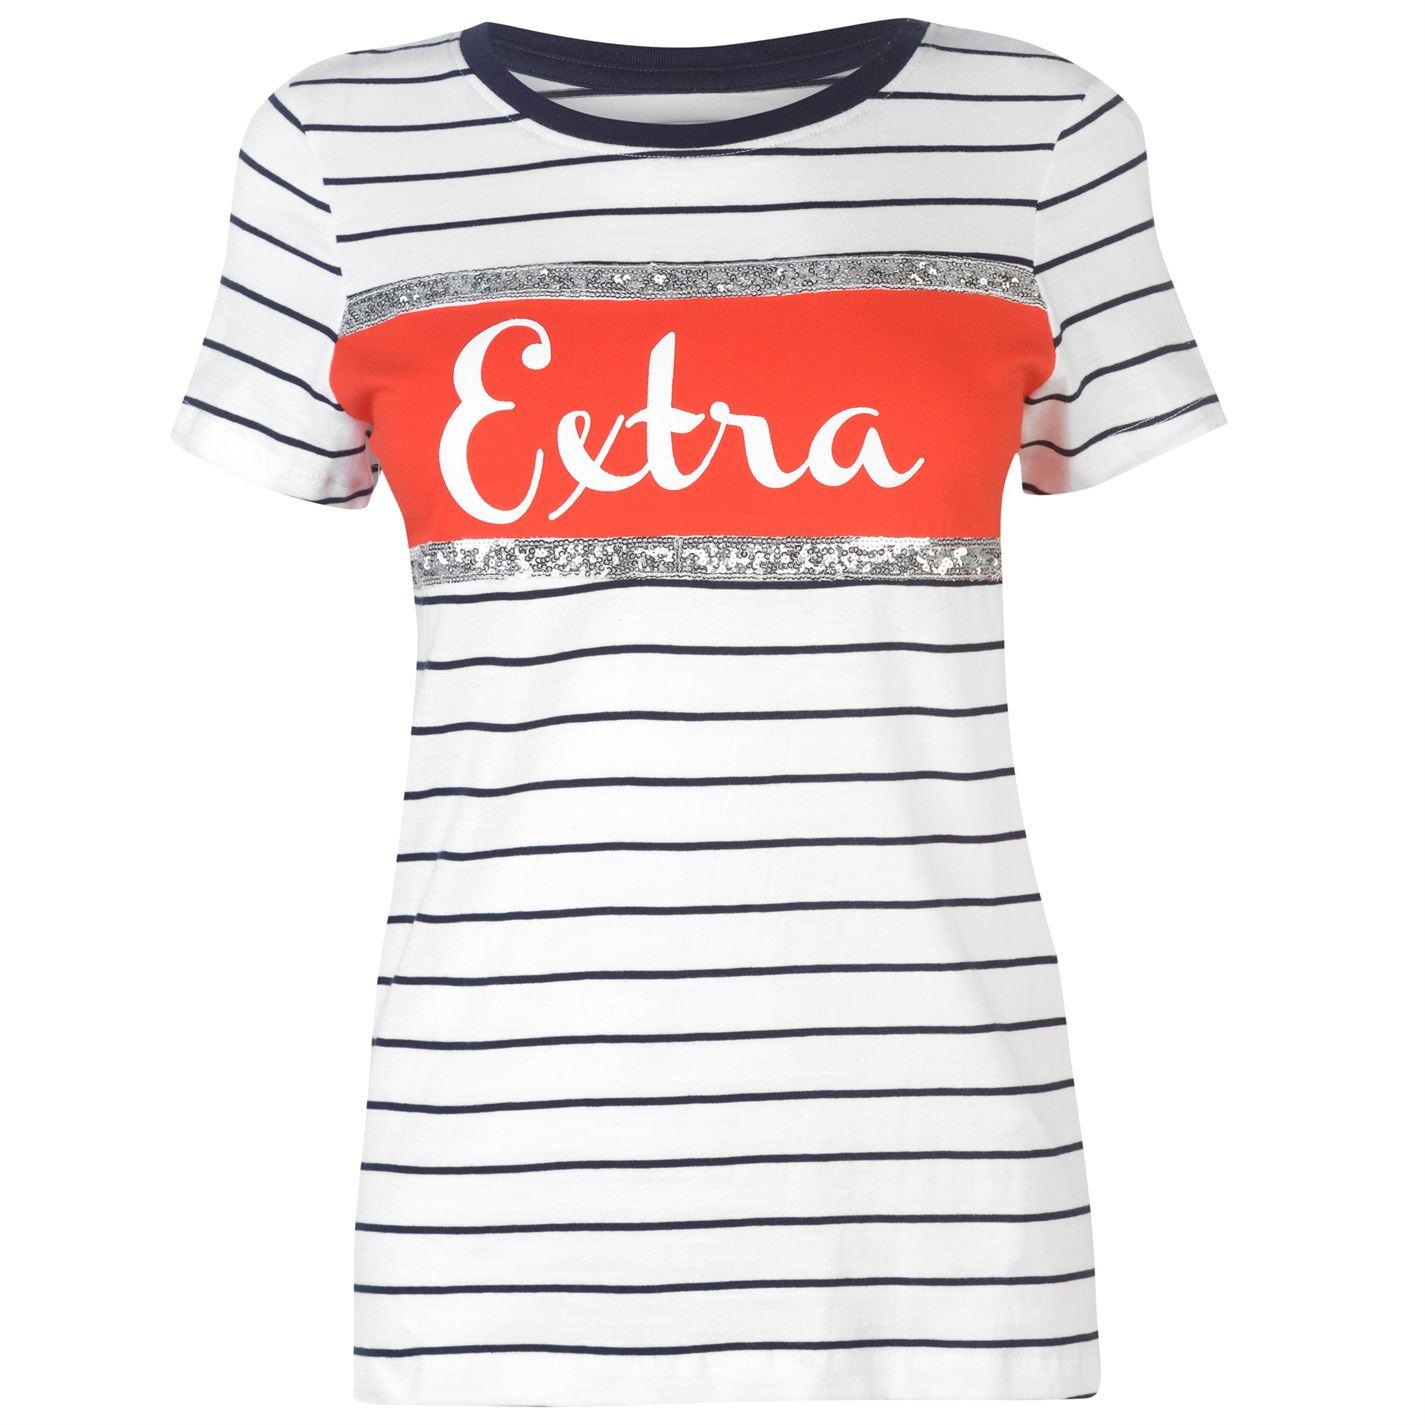 Triko Rock and Rags Sequin Slogan T Shirt dámské